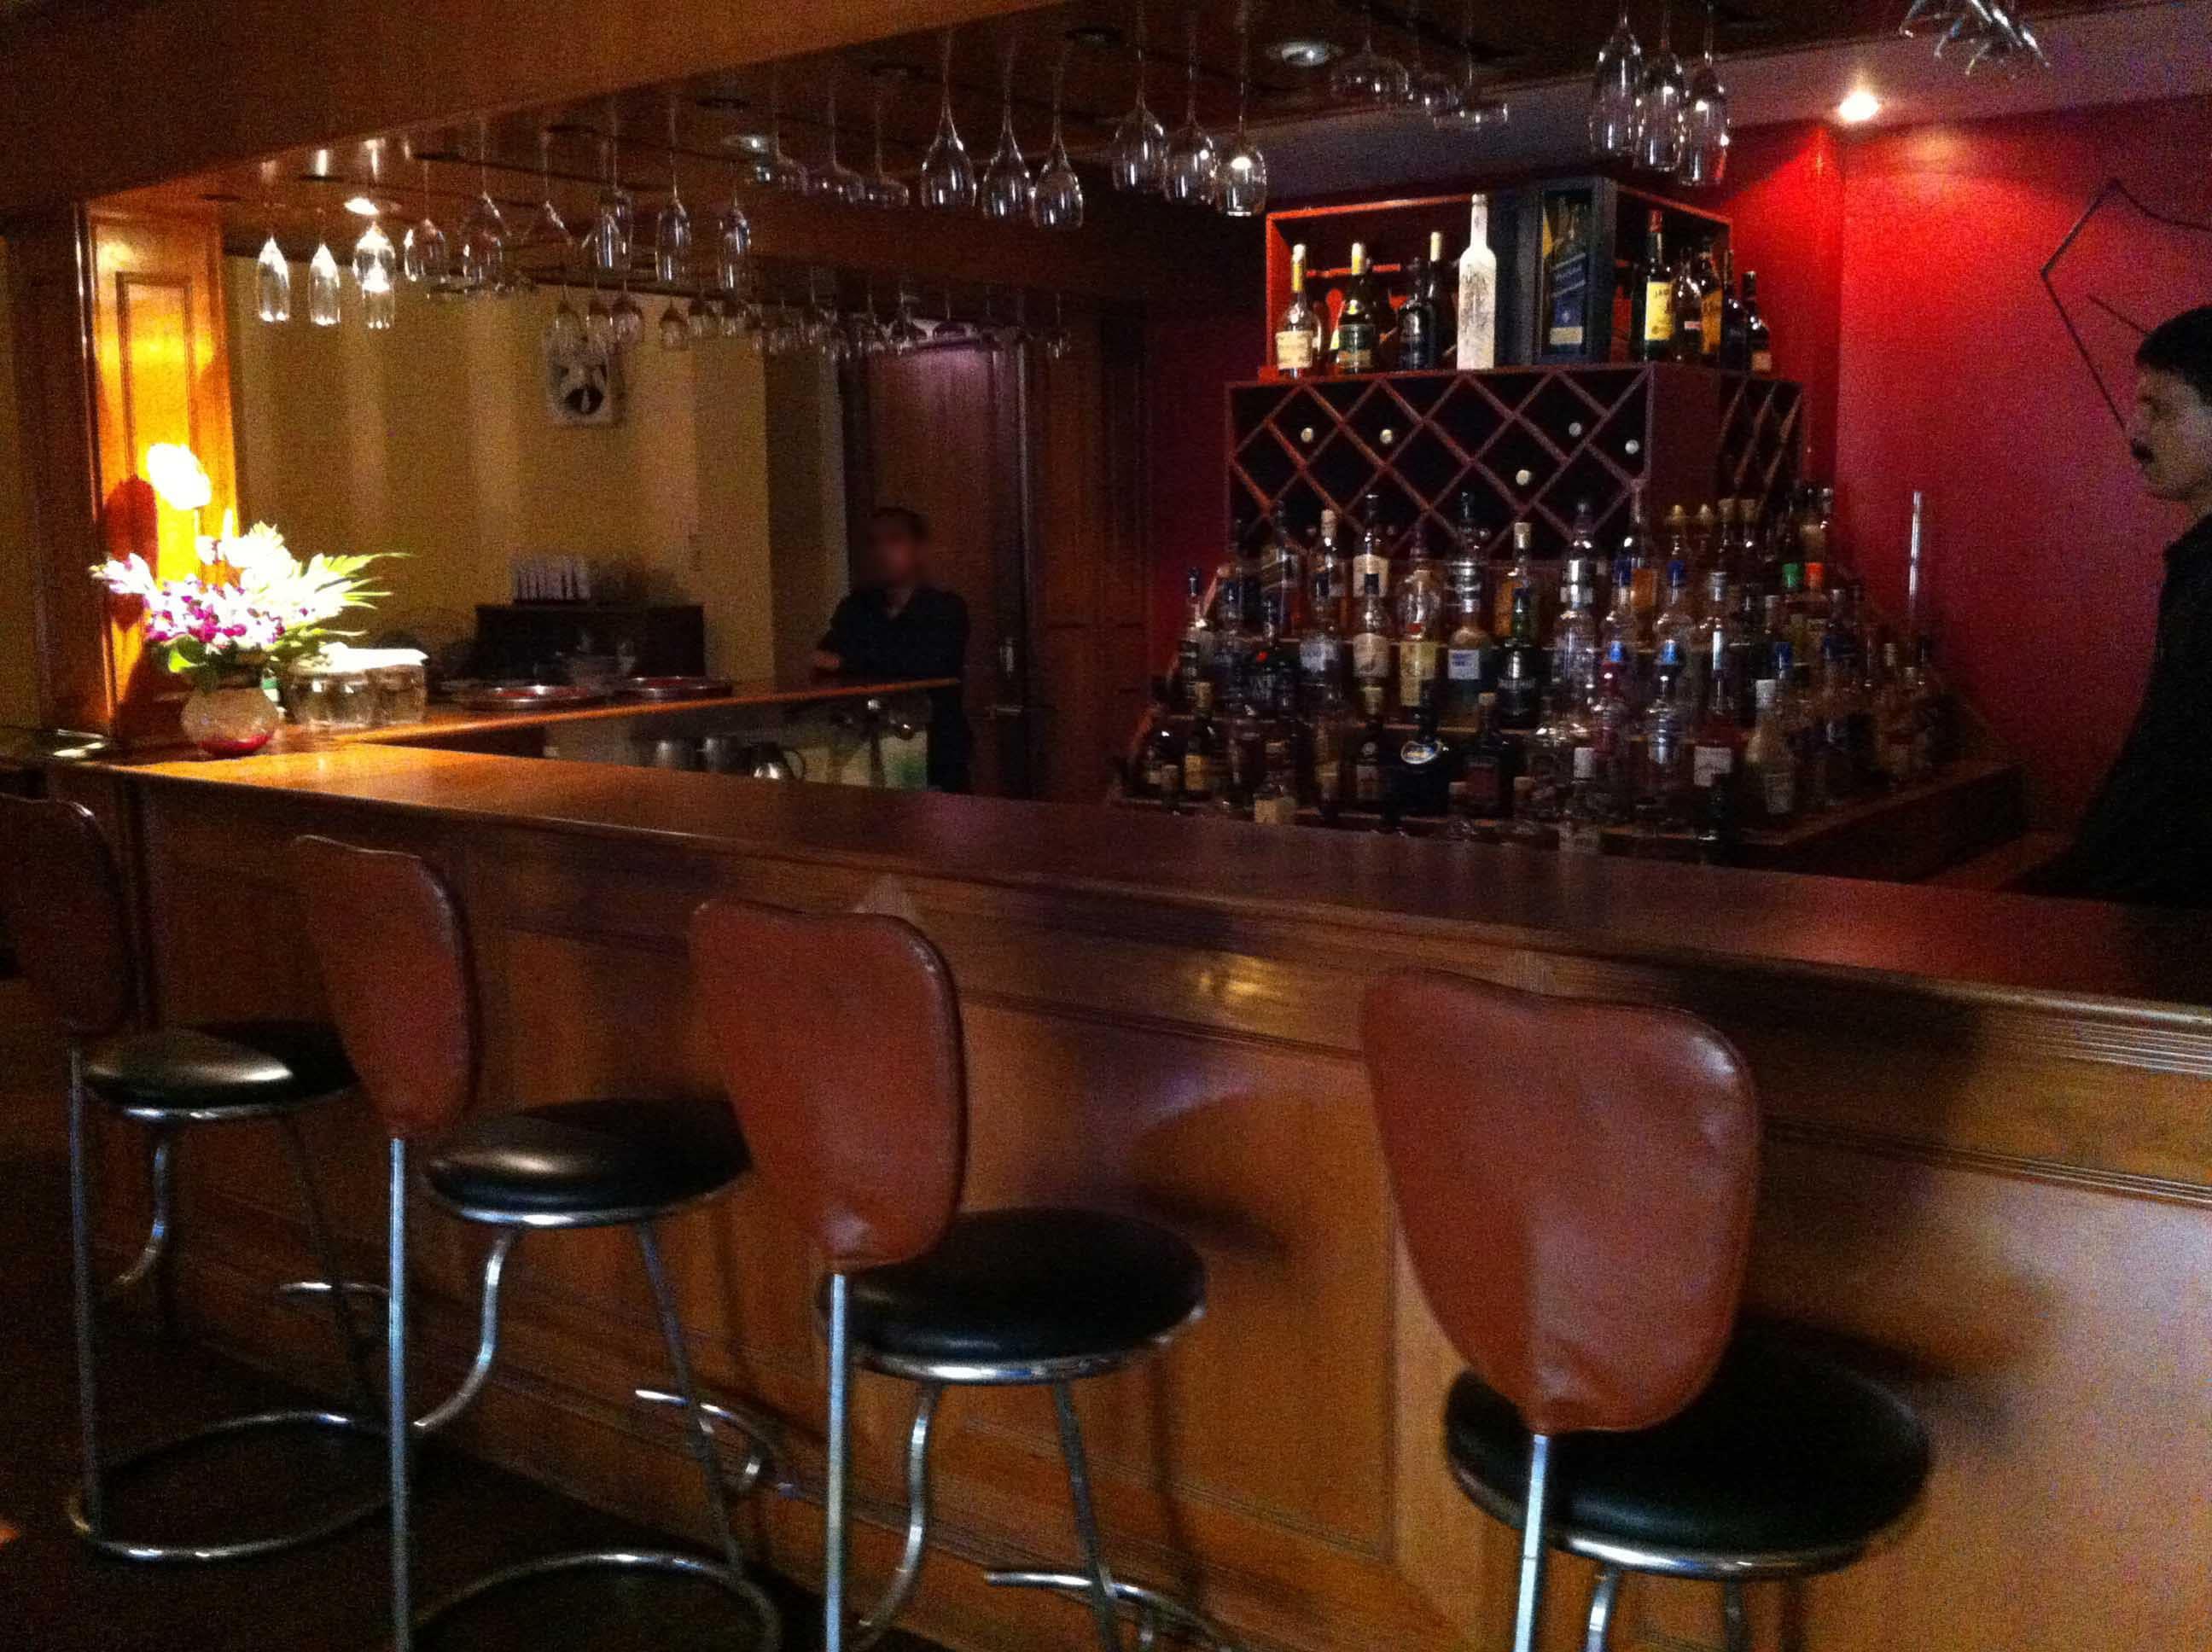 Piano Bar The Landmark Hotel - Ulubari - Guwahati Image